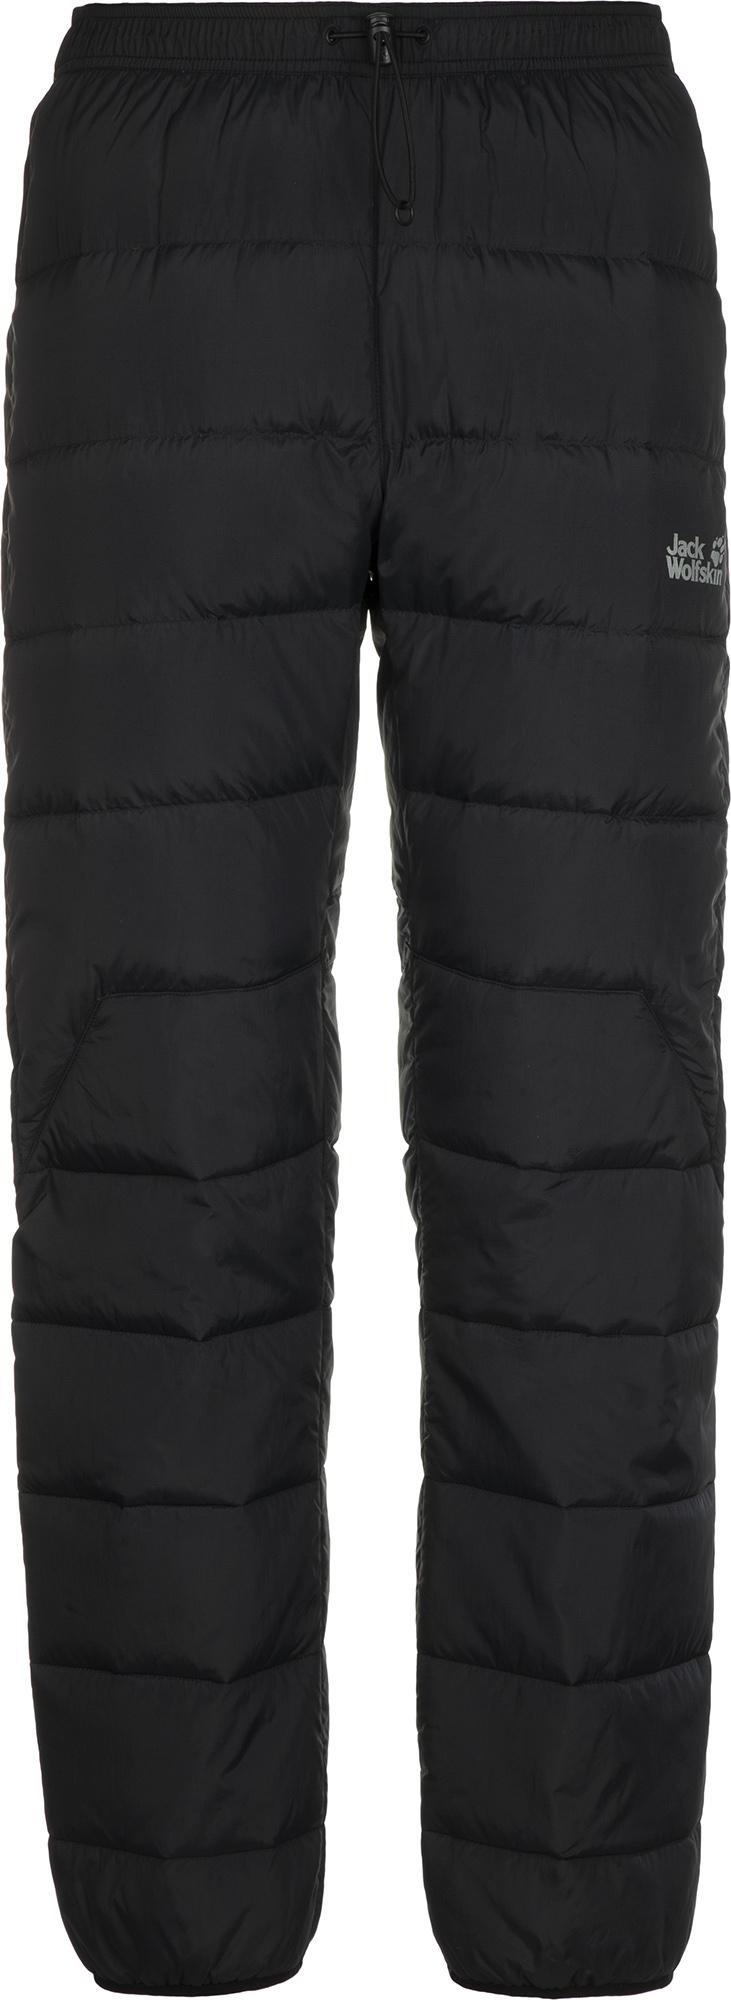 Брюки утепленные мужские Jack Wolfskin Atmosphere, размер 54-56 брюки утепленные jack wolfskin jack wolfskin ja021emkhq63